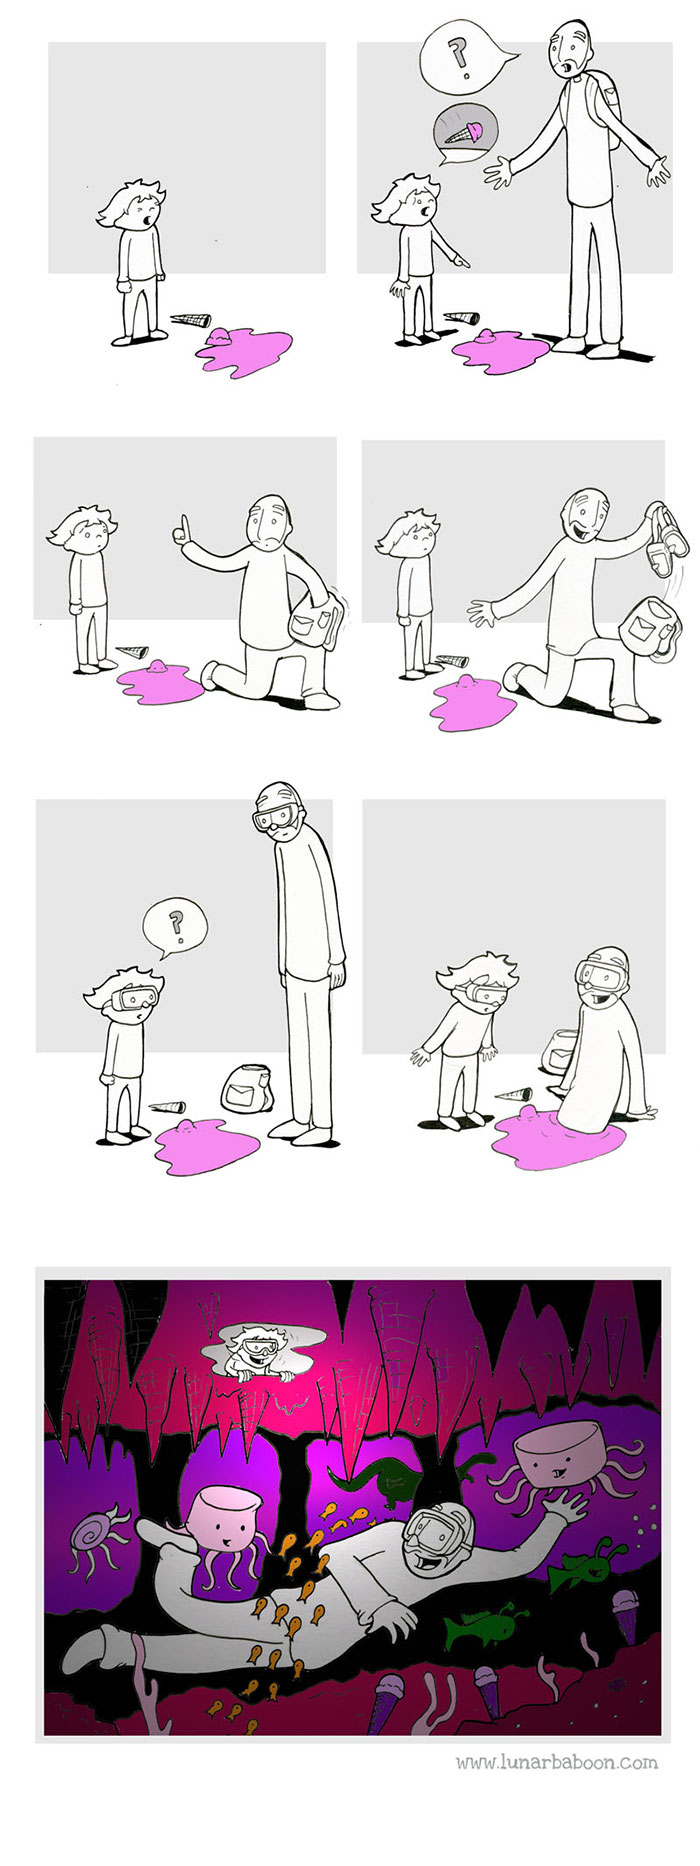 comics-padre-hijo-lunarbaboon-6